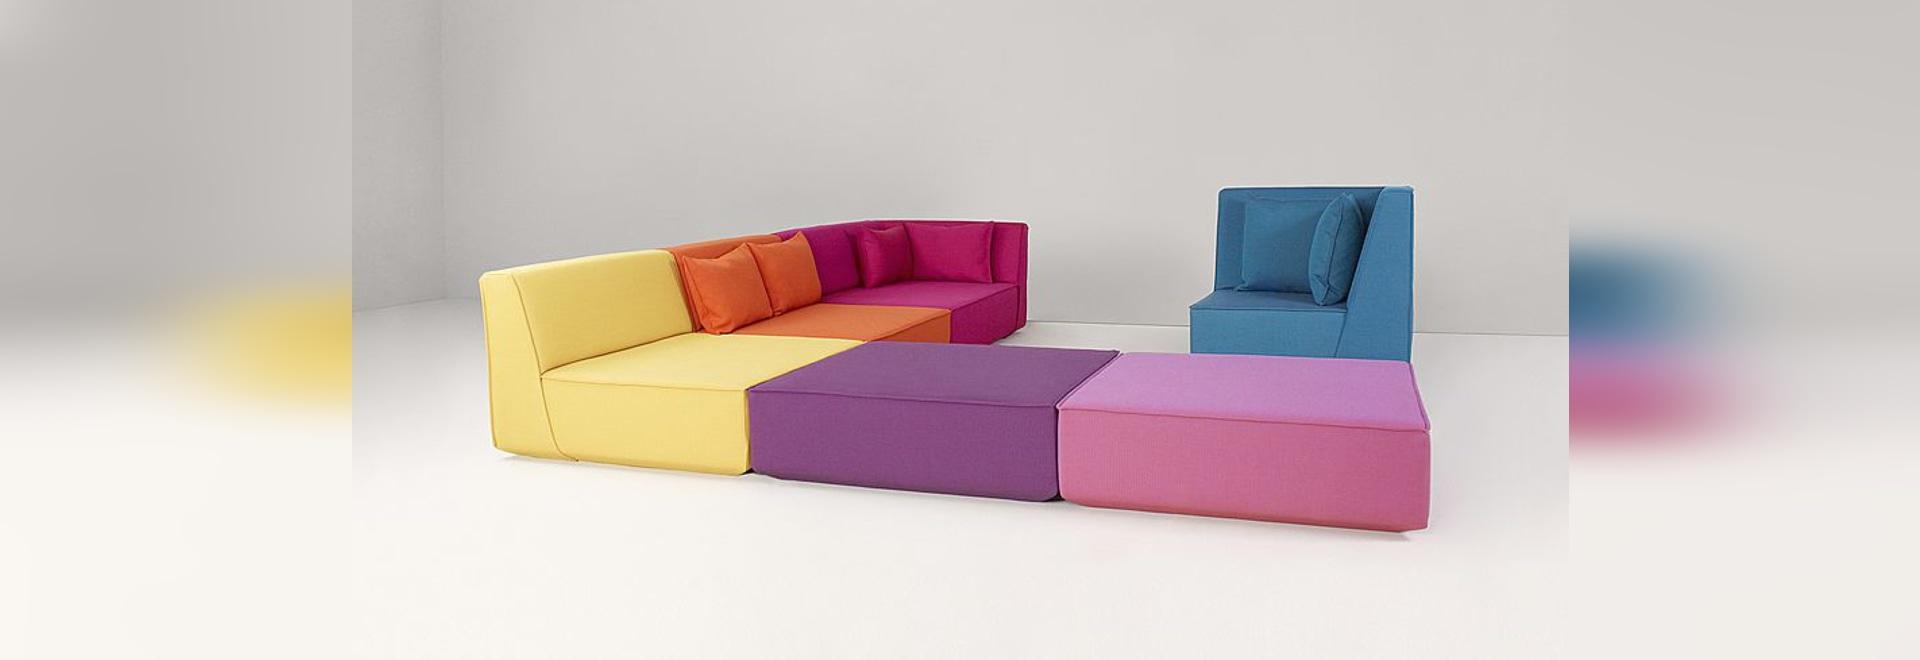 Superieur Cubit® U2013 Modular Sofa System Manufacturer Cubit U2013